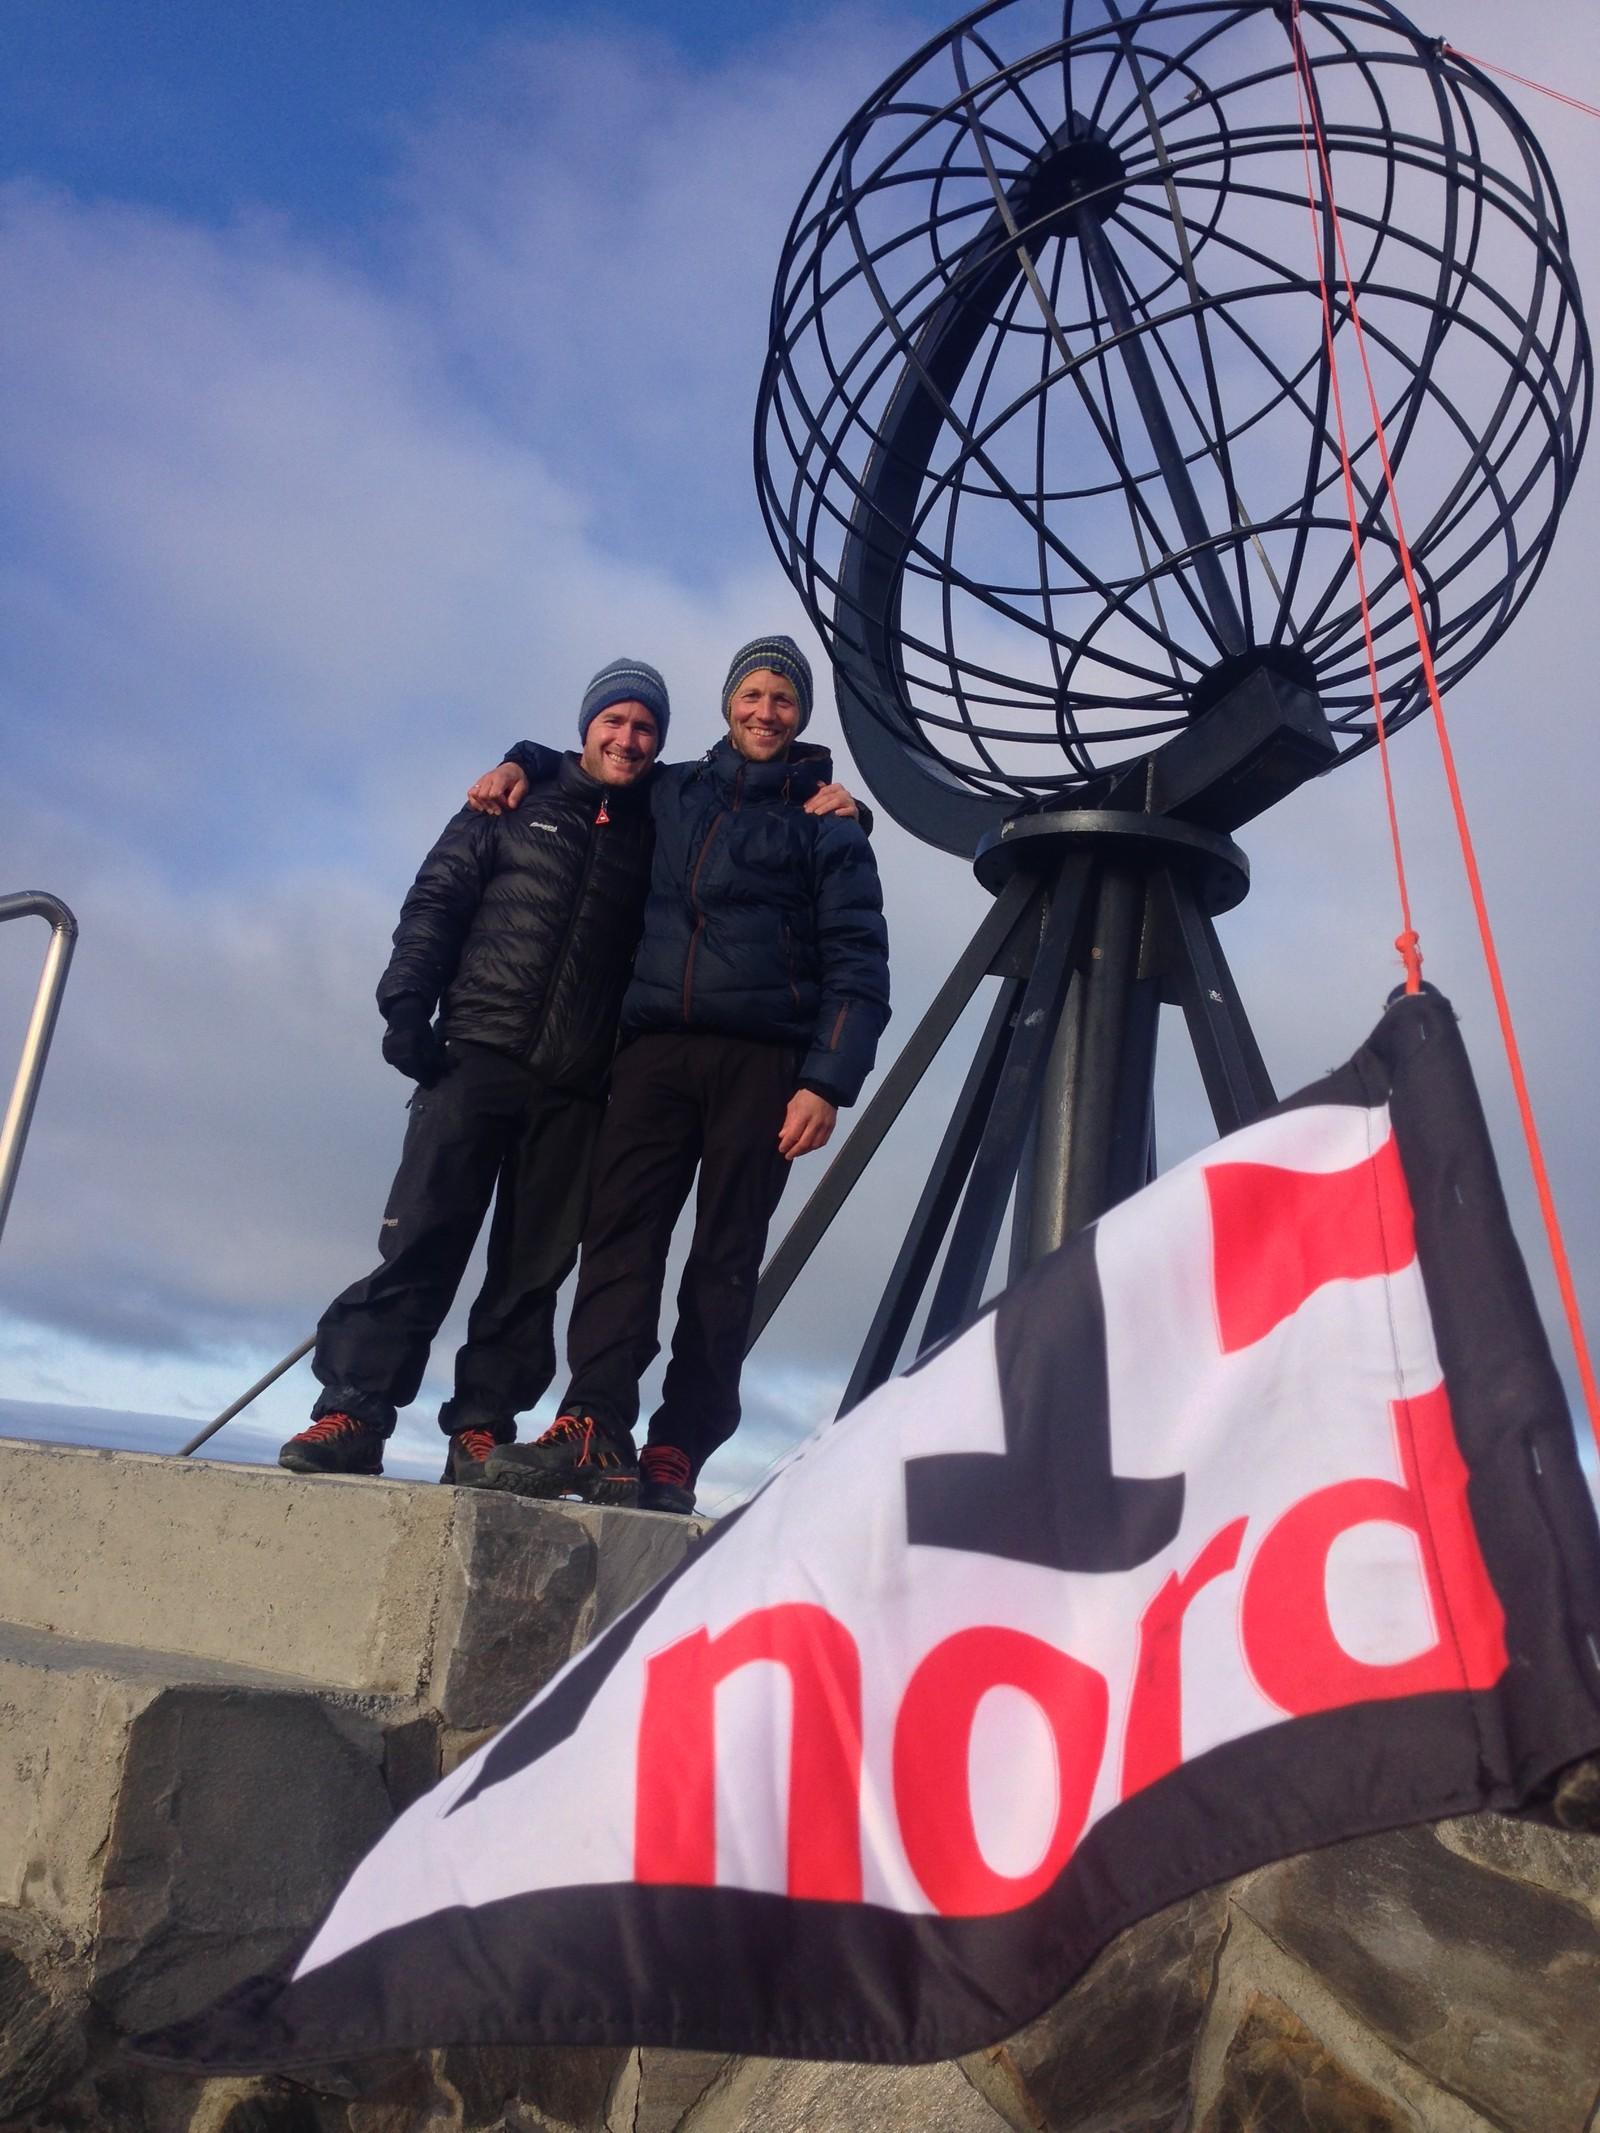 Christopher Fornebo og Espen Oscar Olsen er i mål for endte gang med 71 grader nord.